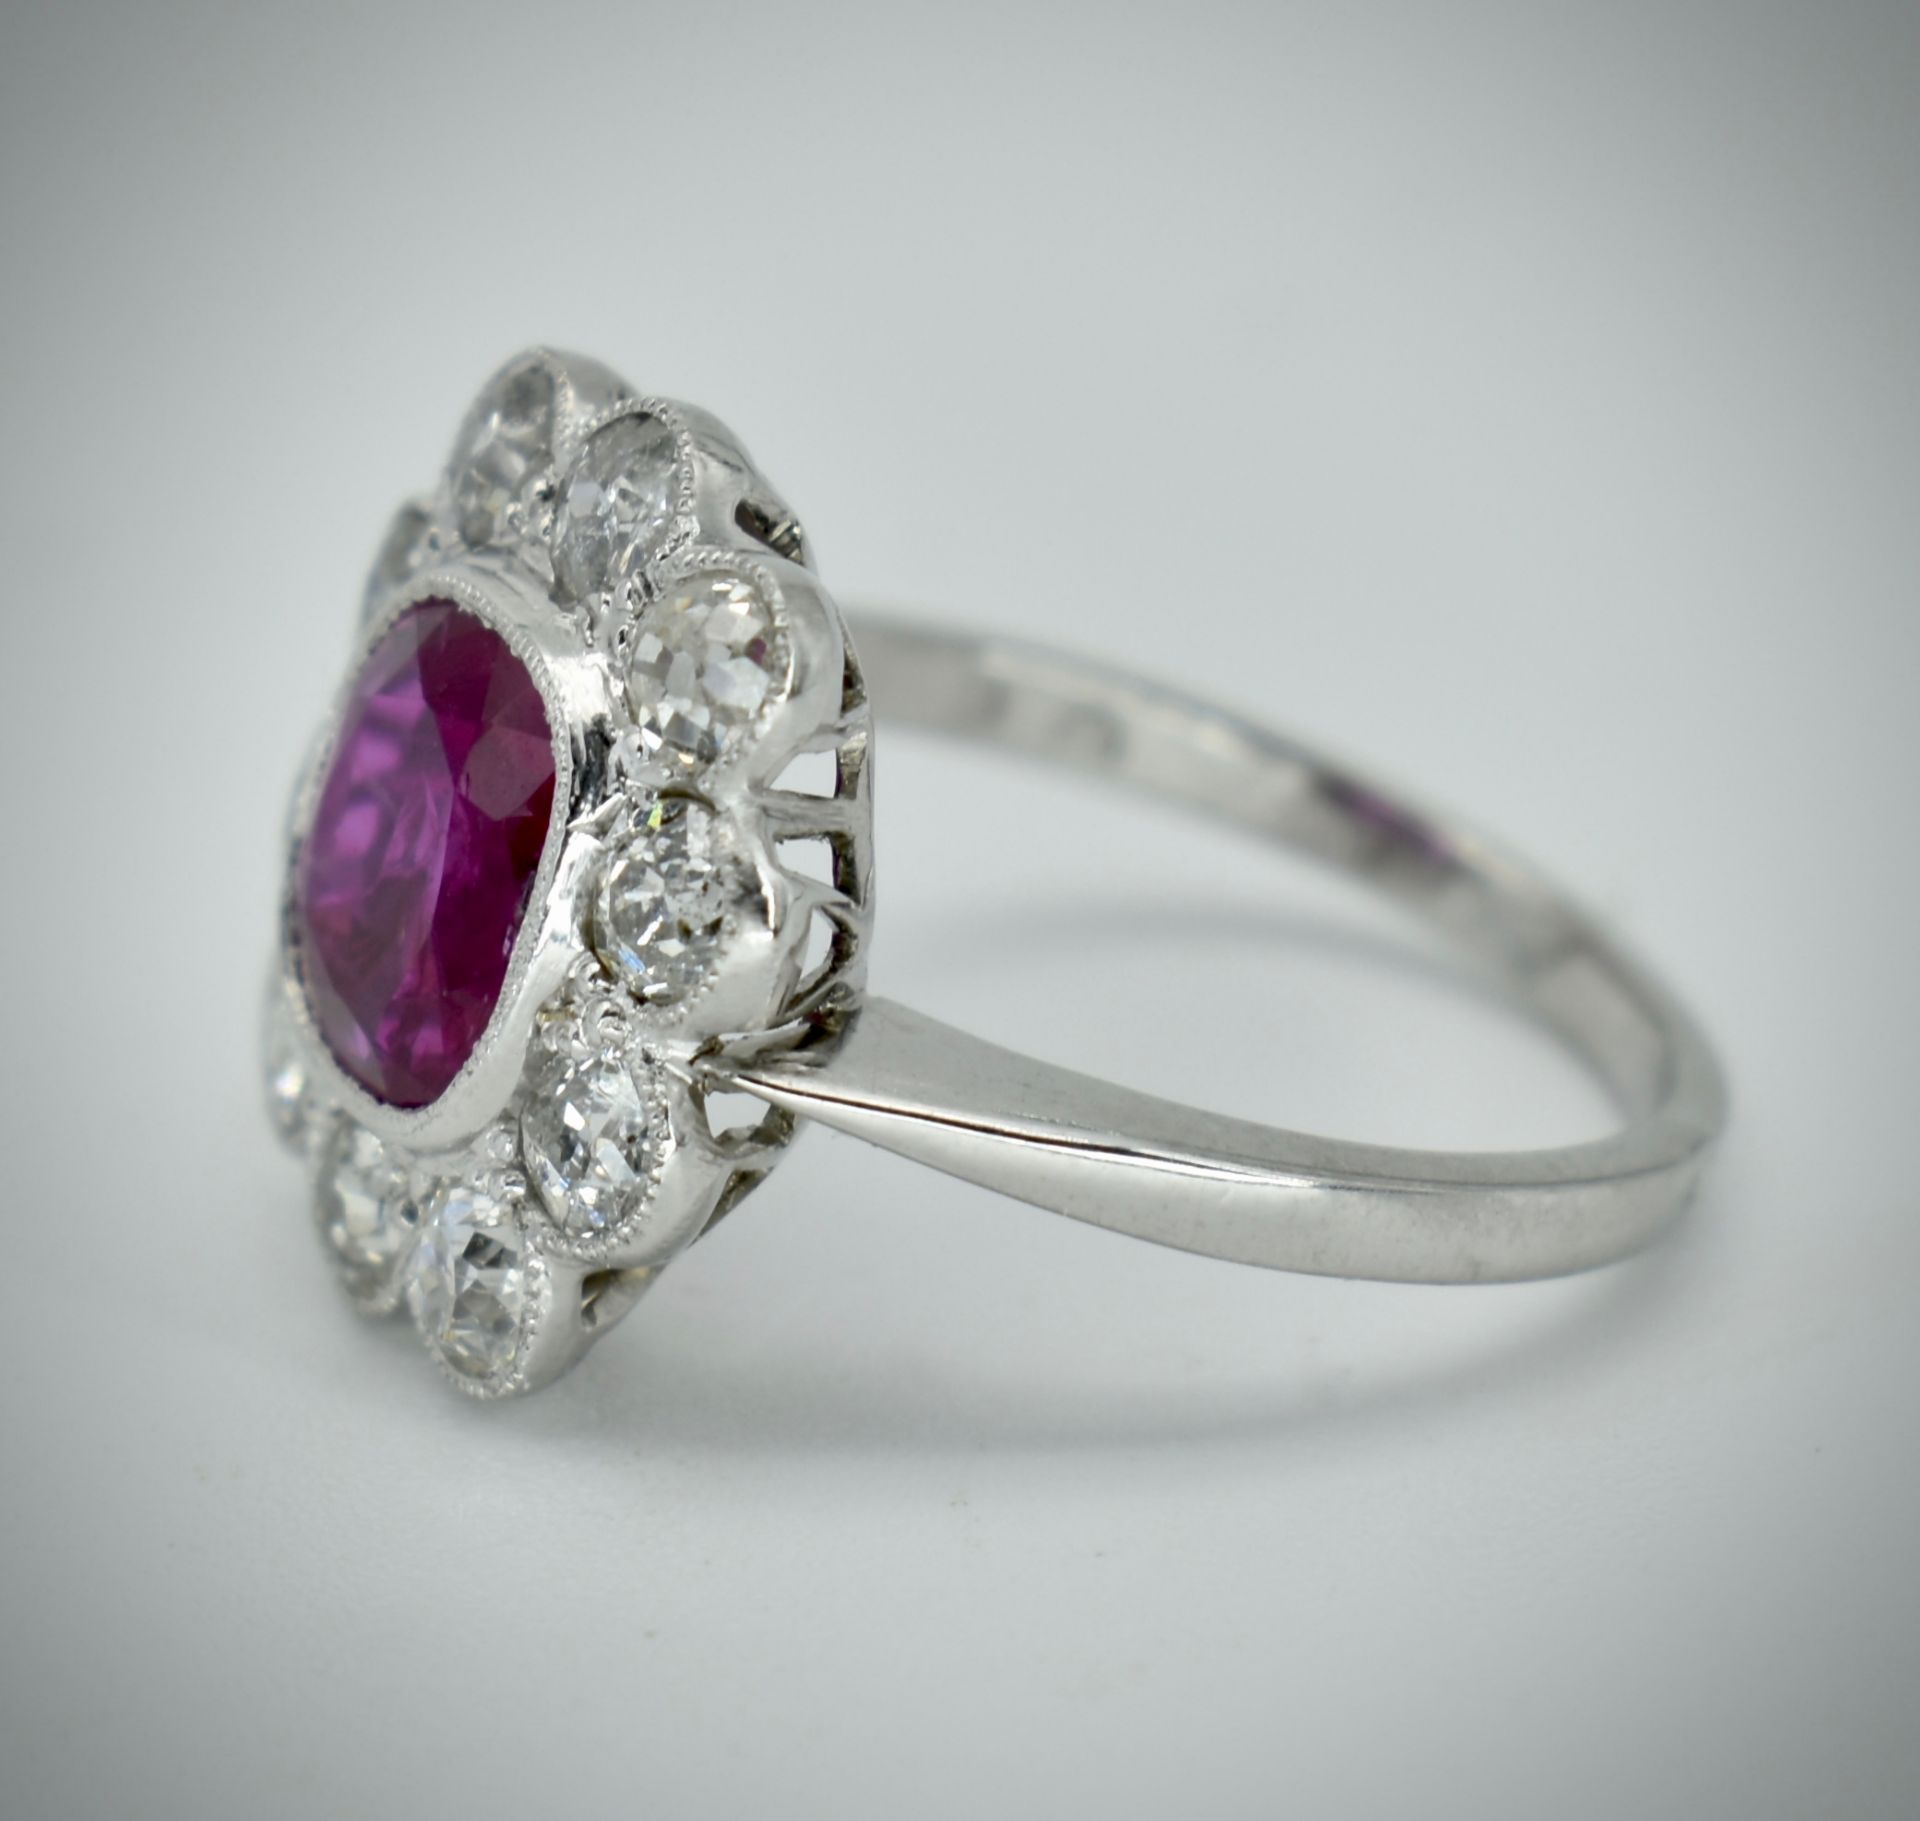 950 Platinum Burma Ruby & Diamond Cluster Ring - Image 5 of 5